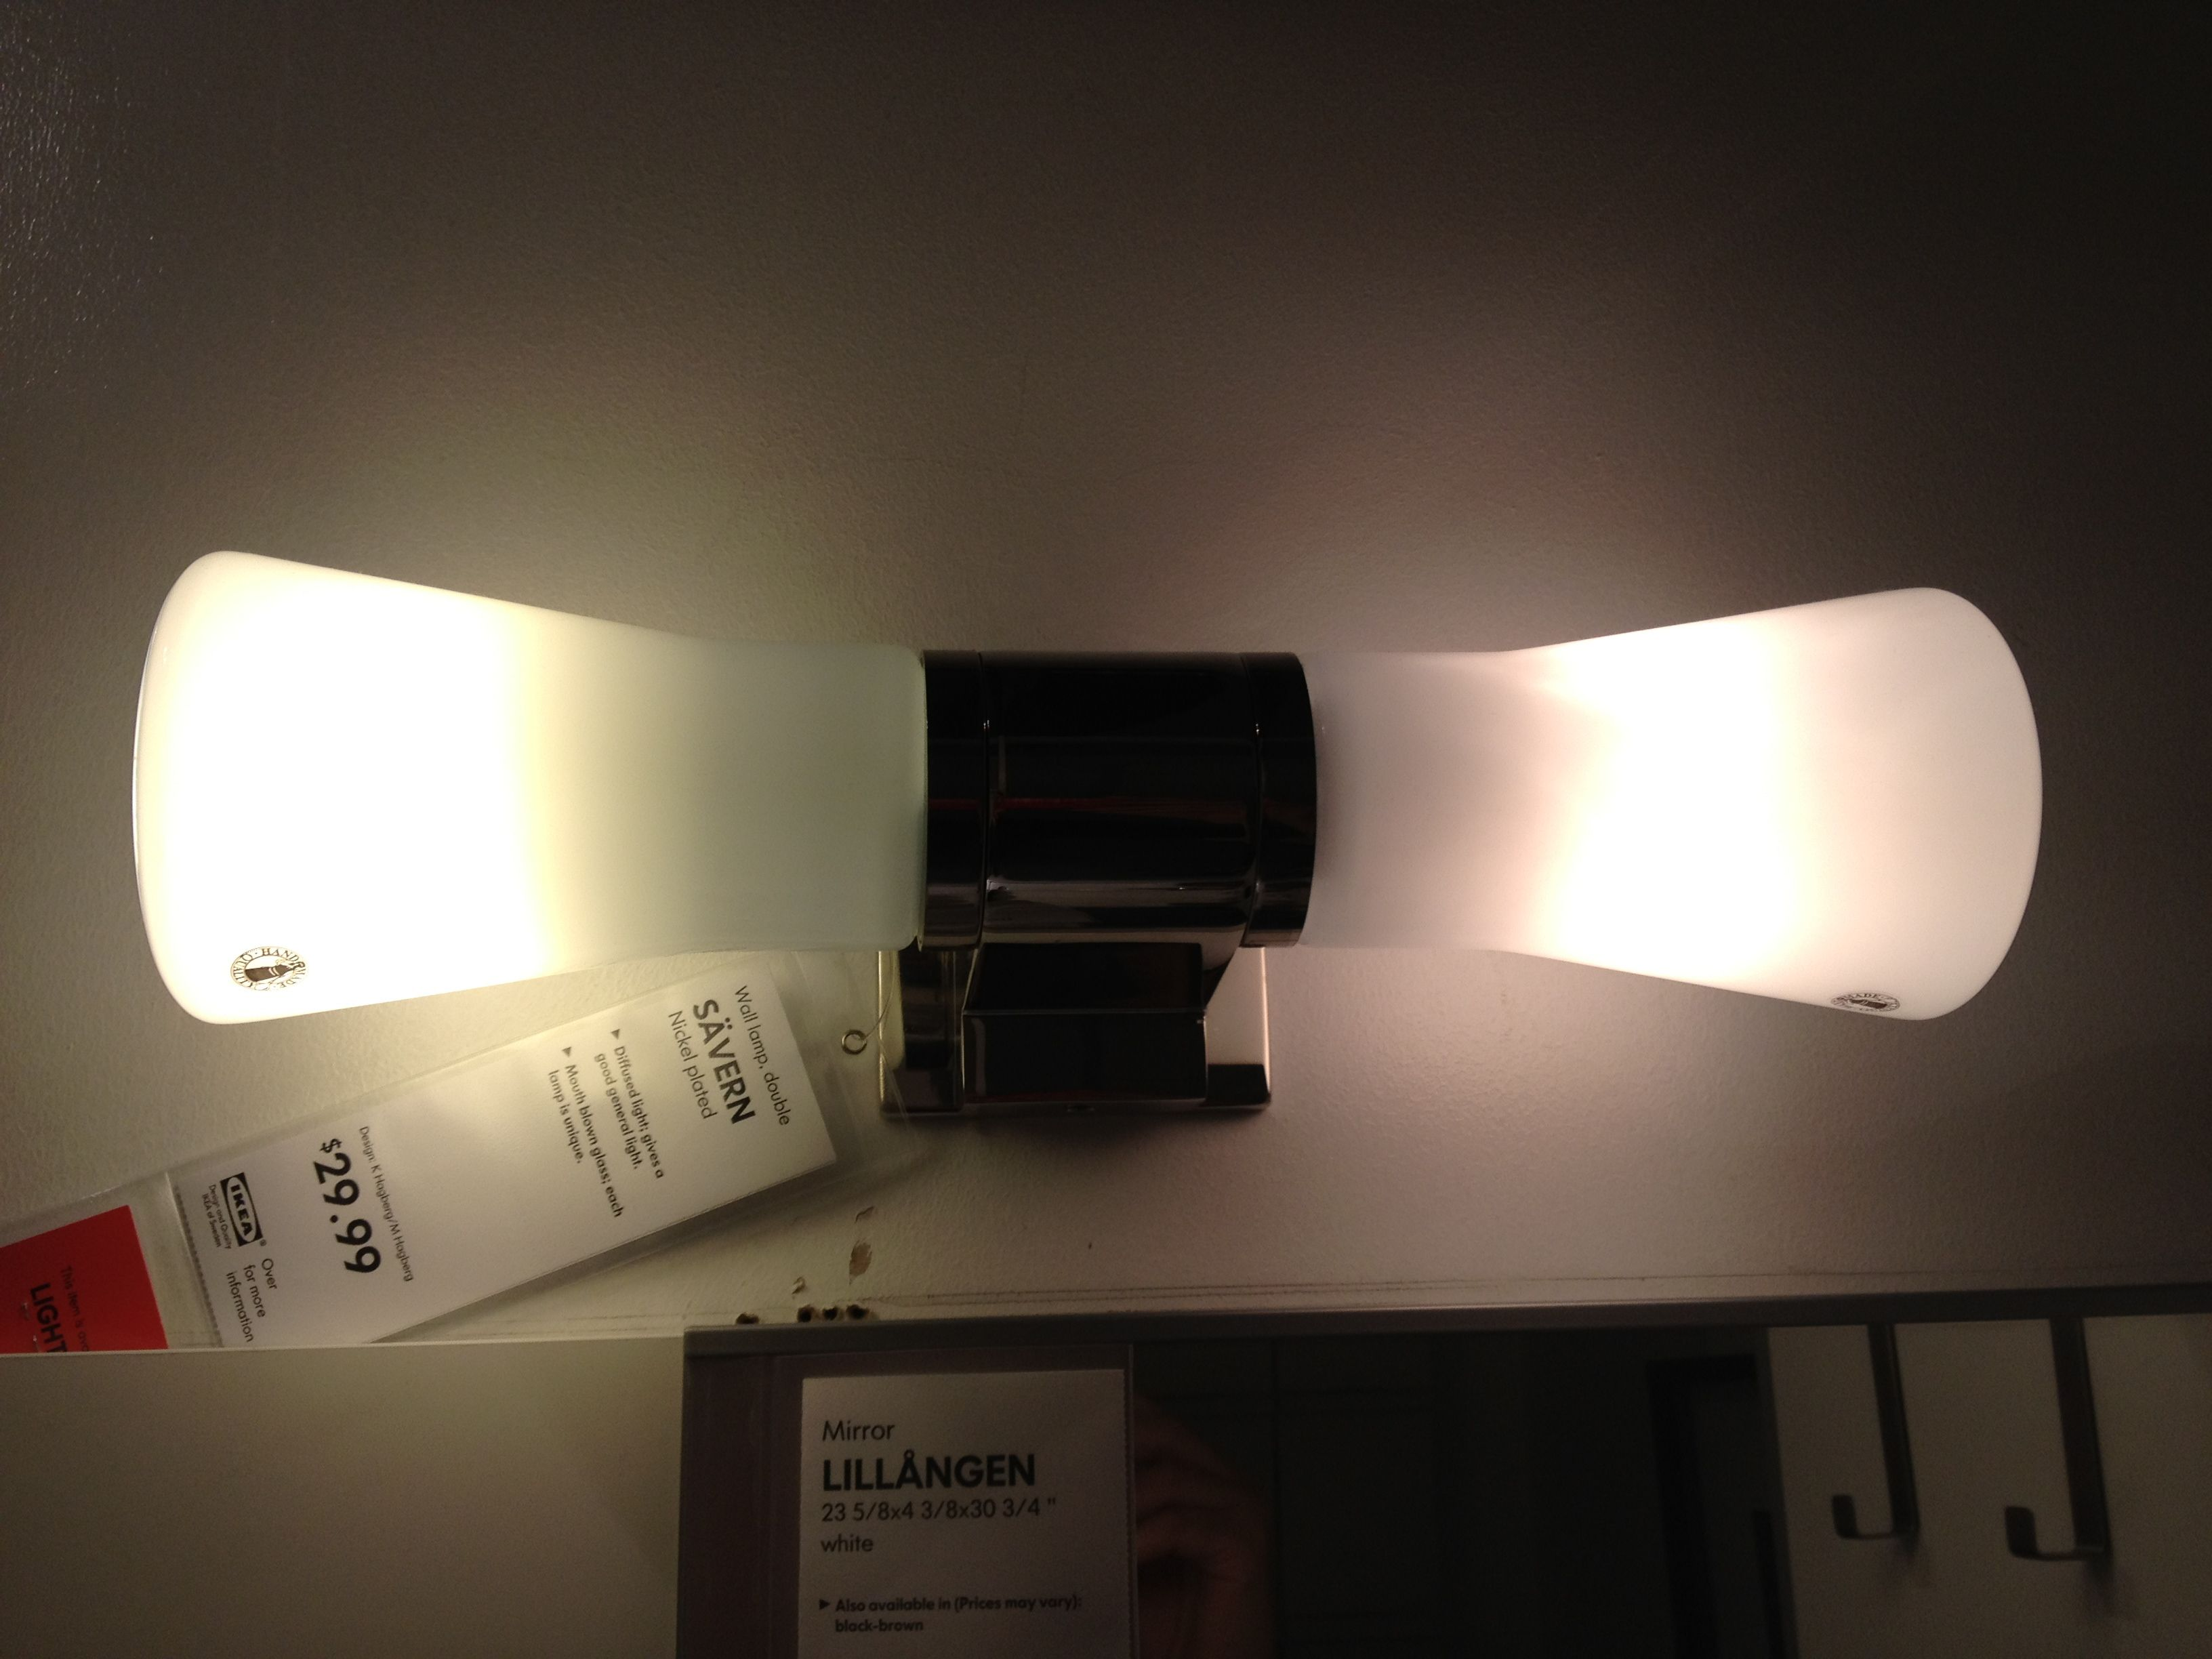 ikea bath lighting. IKEA Bathroom Light Ikea Bath Lighting I